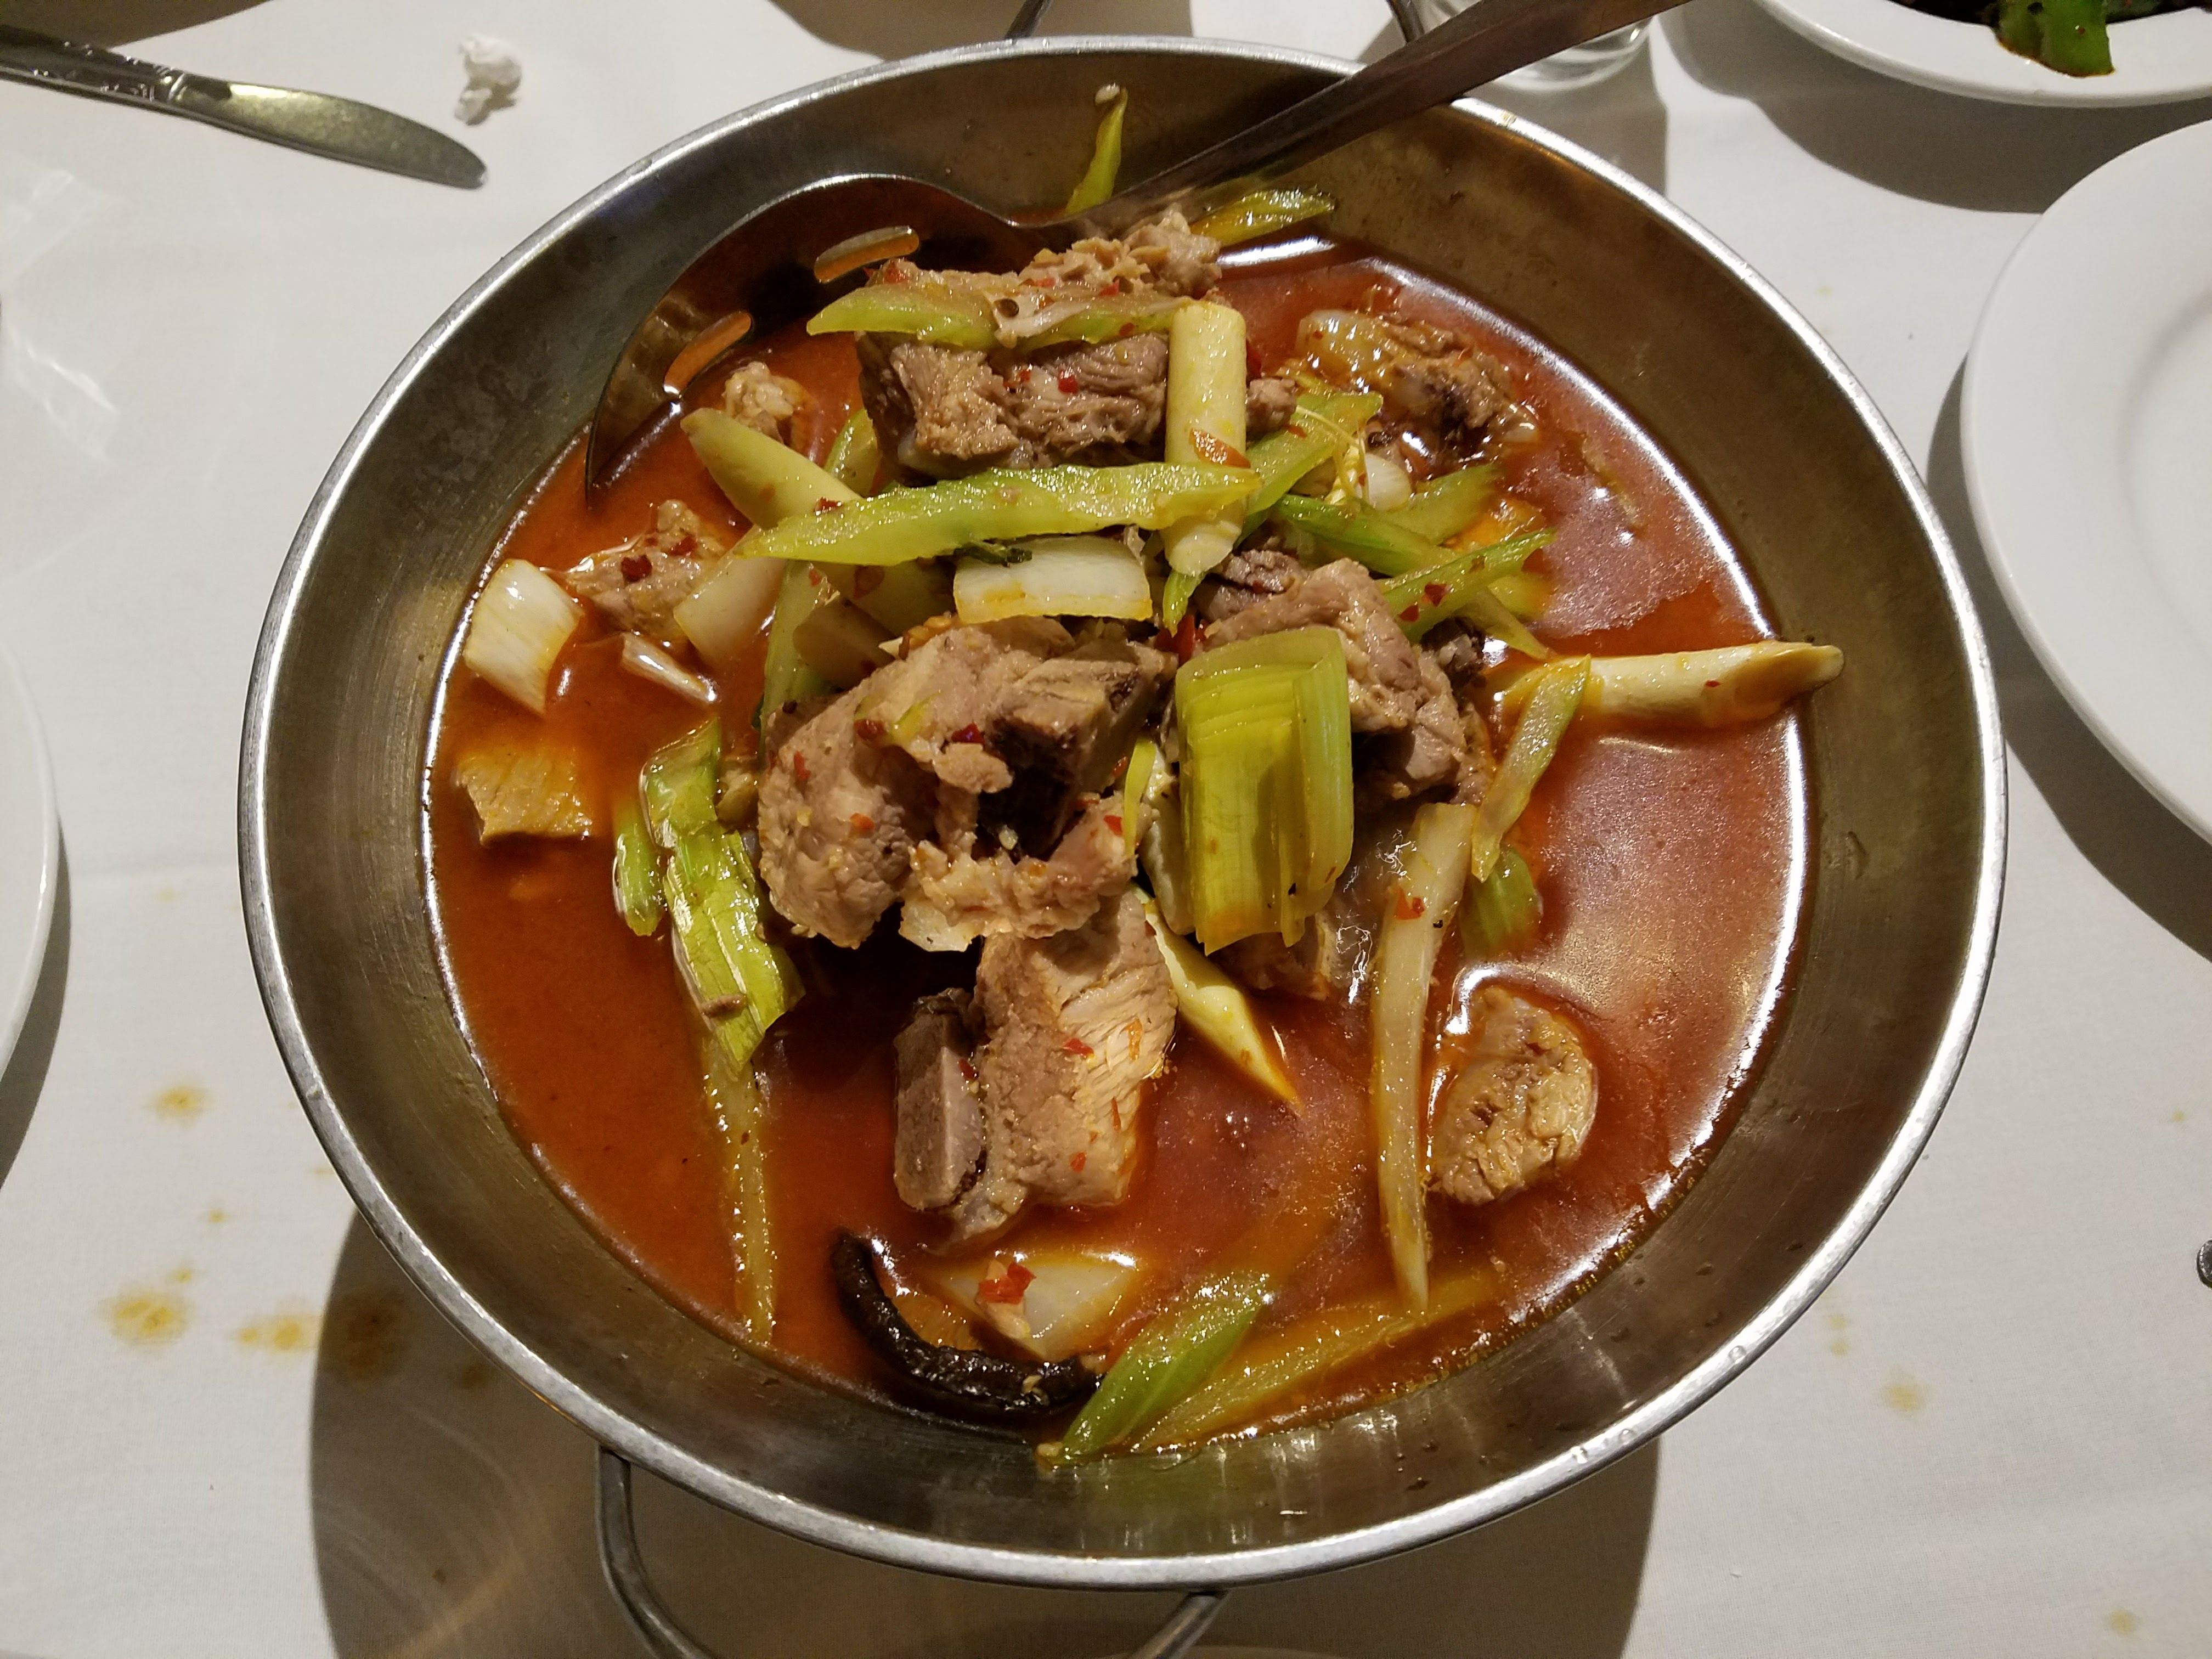 13 ting's kitchen spicy pork ribs